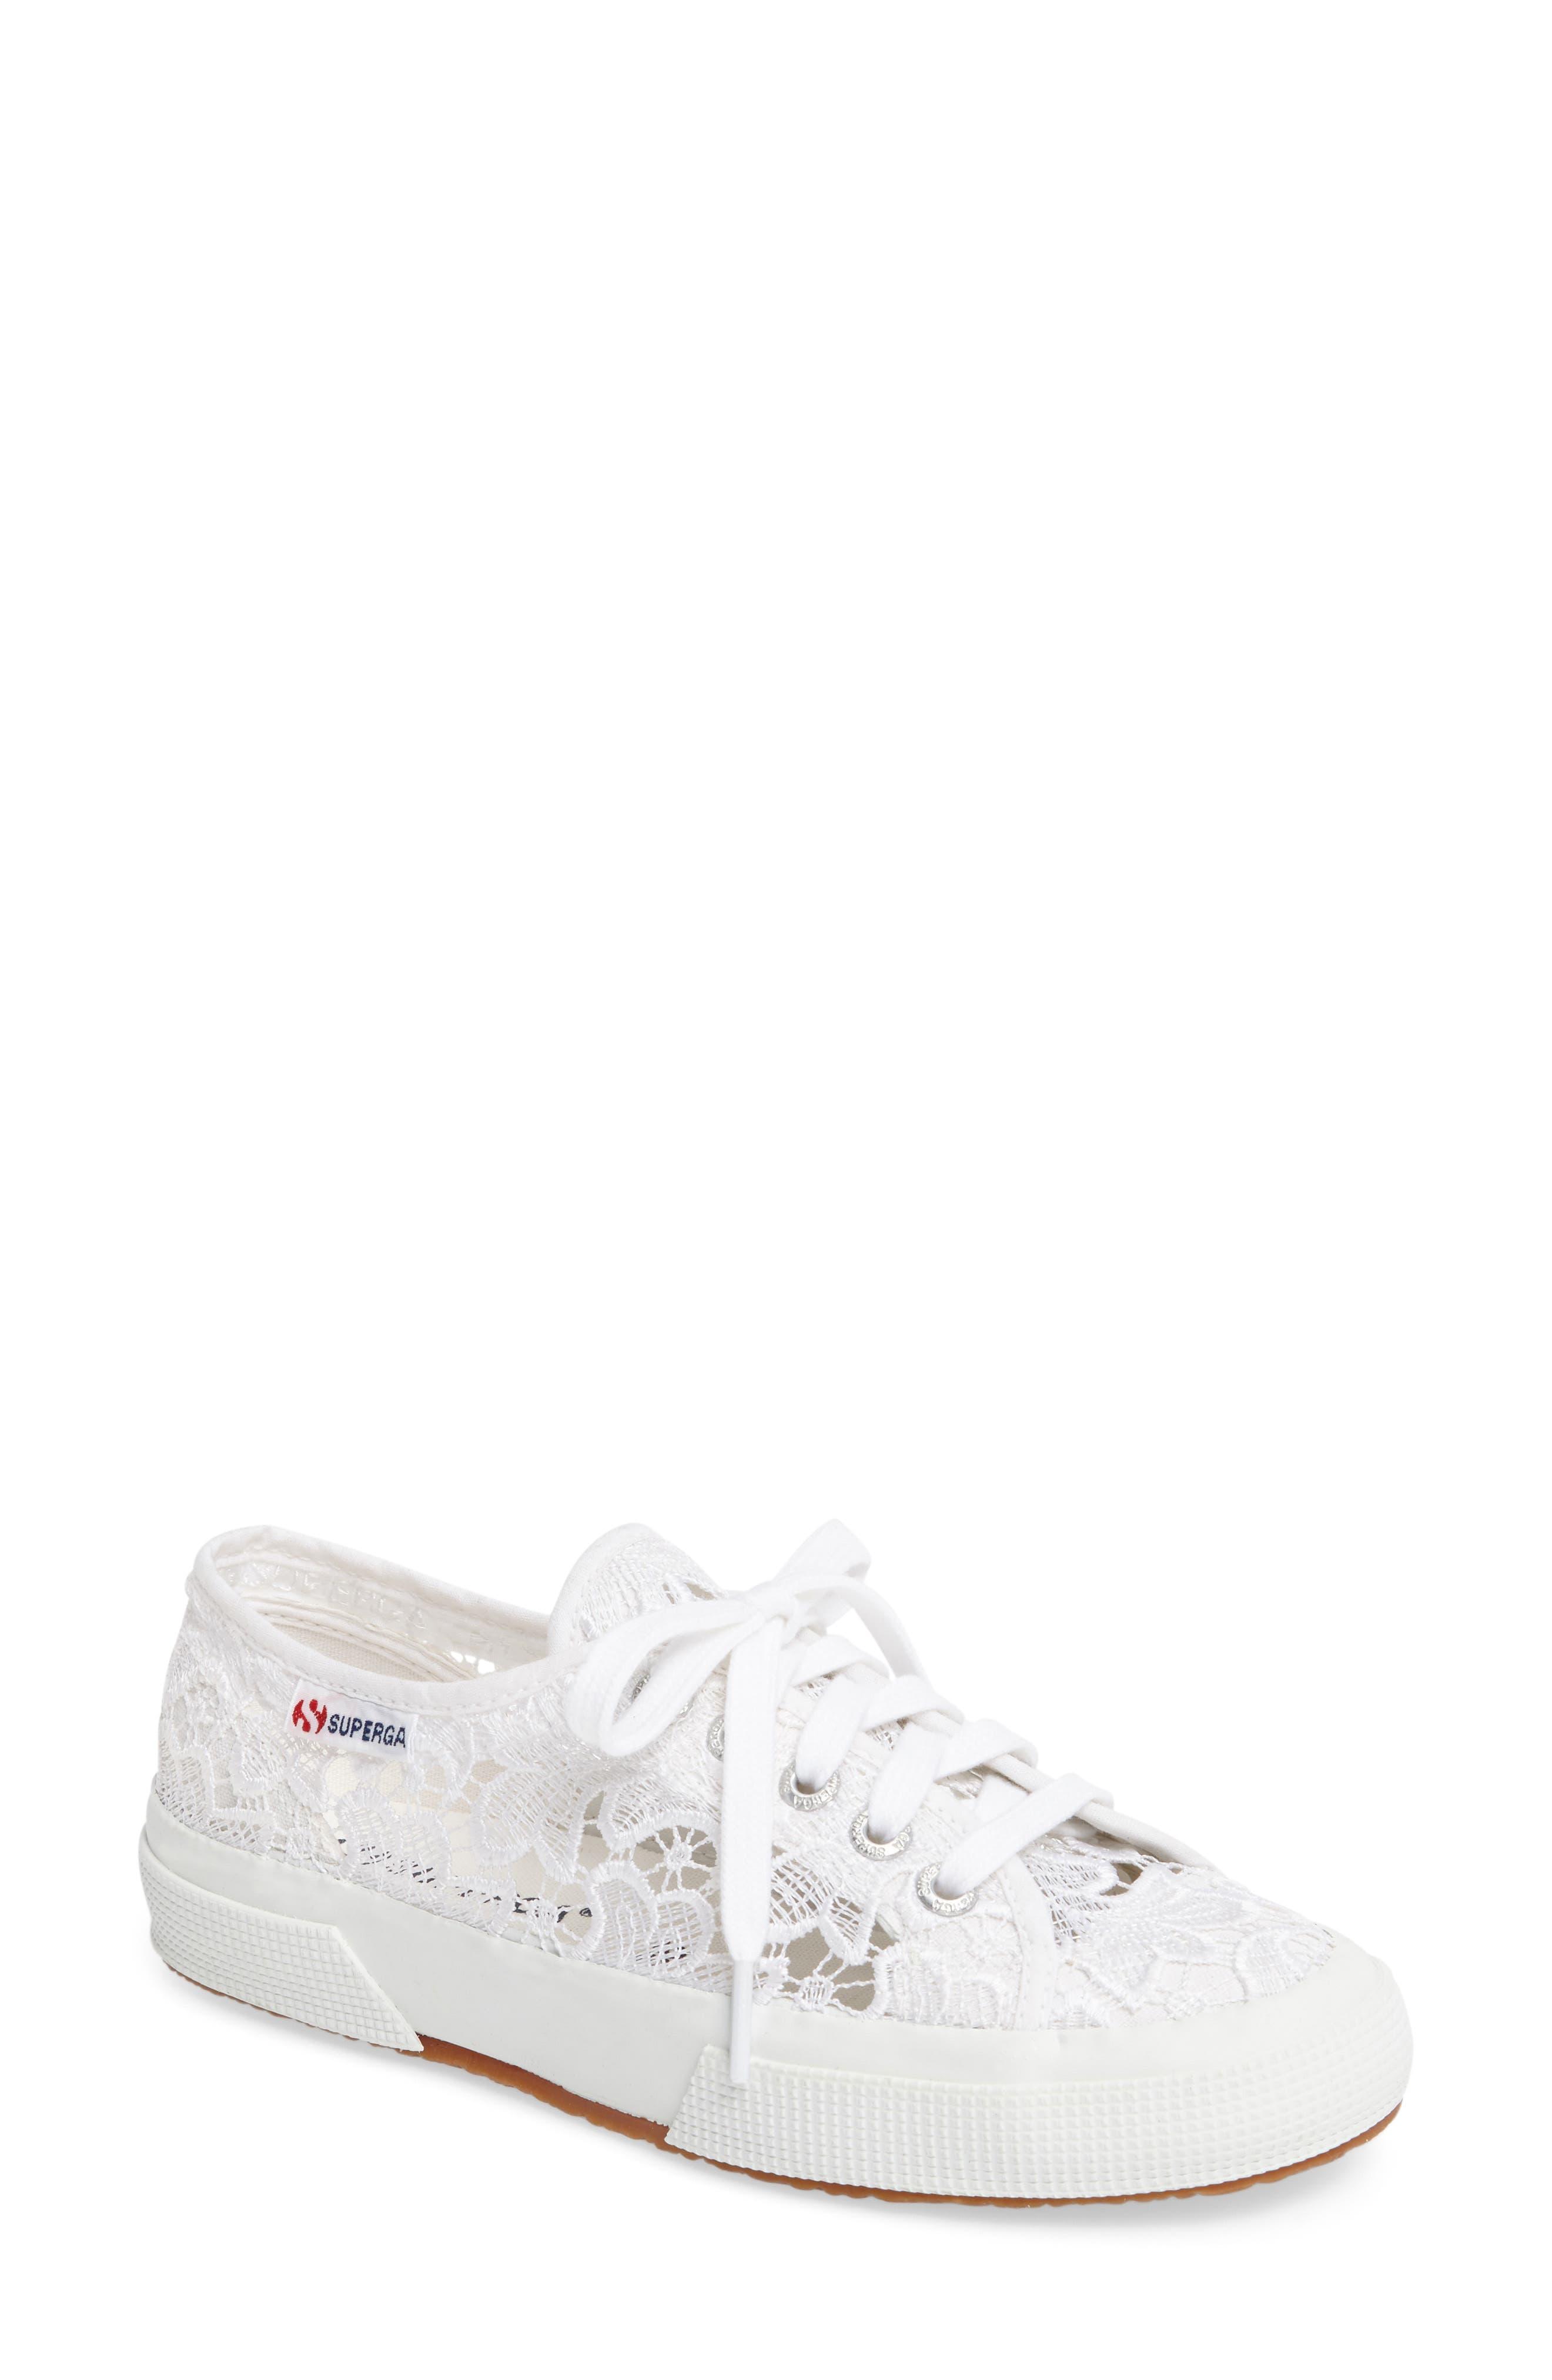 Superga Lace Sneaker (Women)